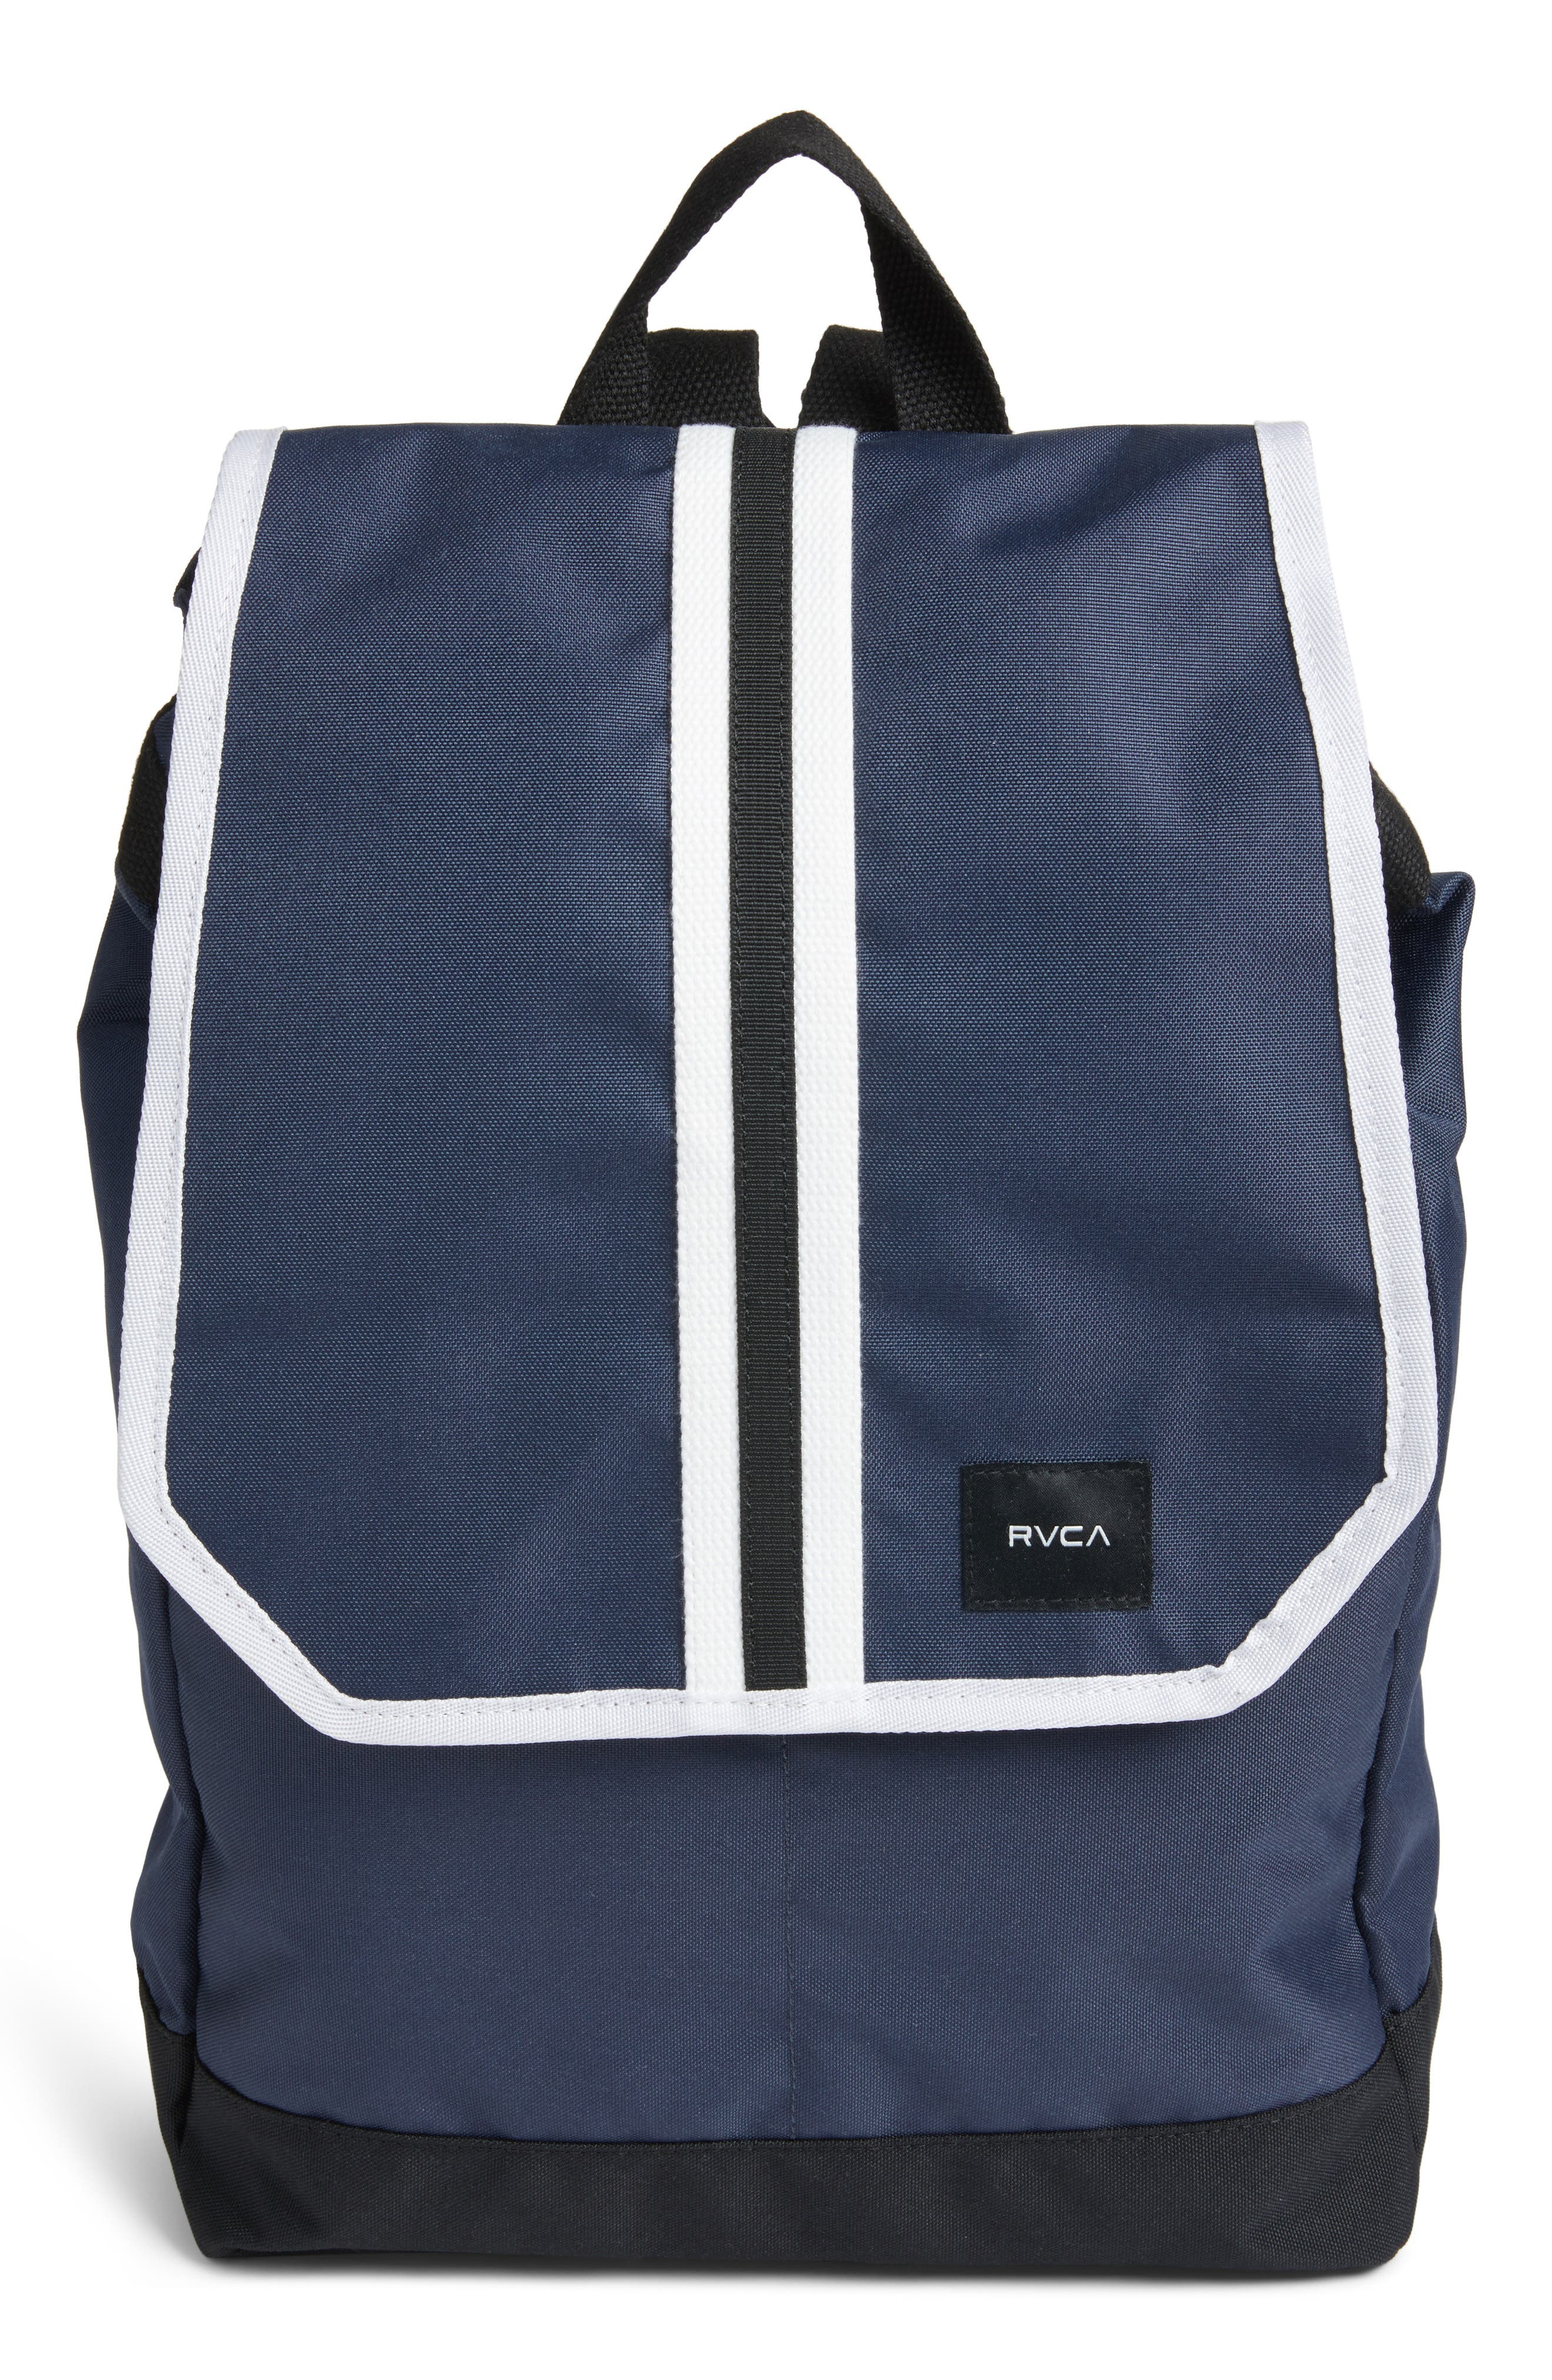 Dazed Backpack,                             Main thumbnail 1, color,                             Federal Blue